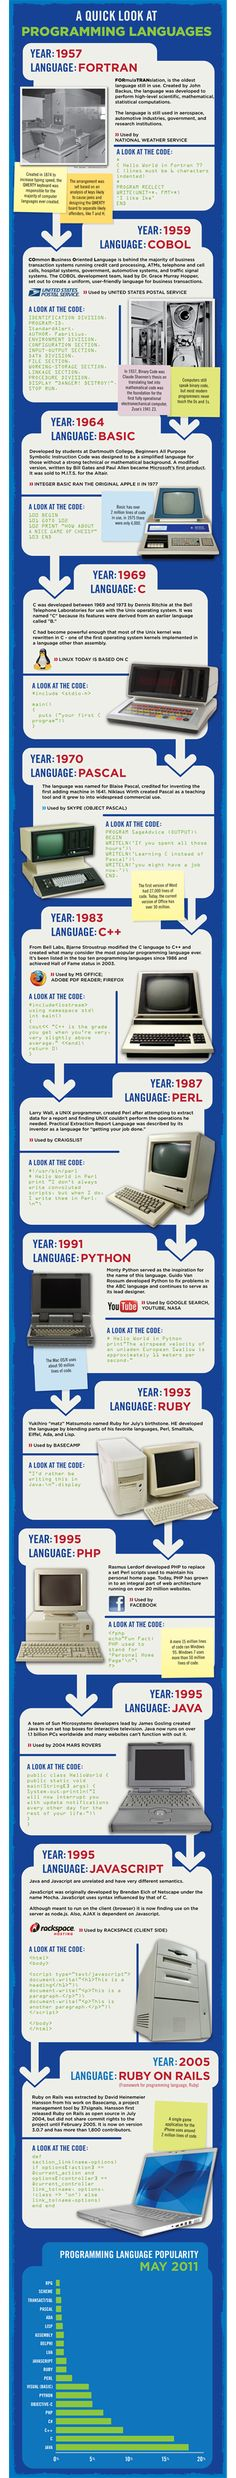 History of Computer Languages  | Visual.ly